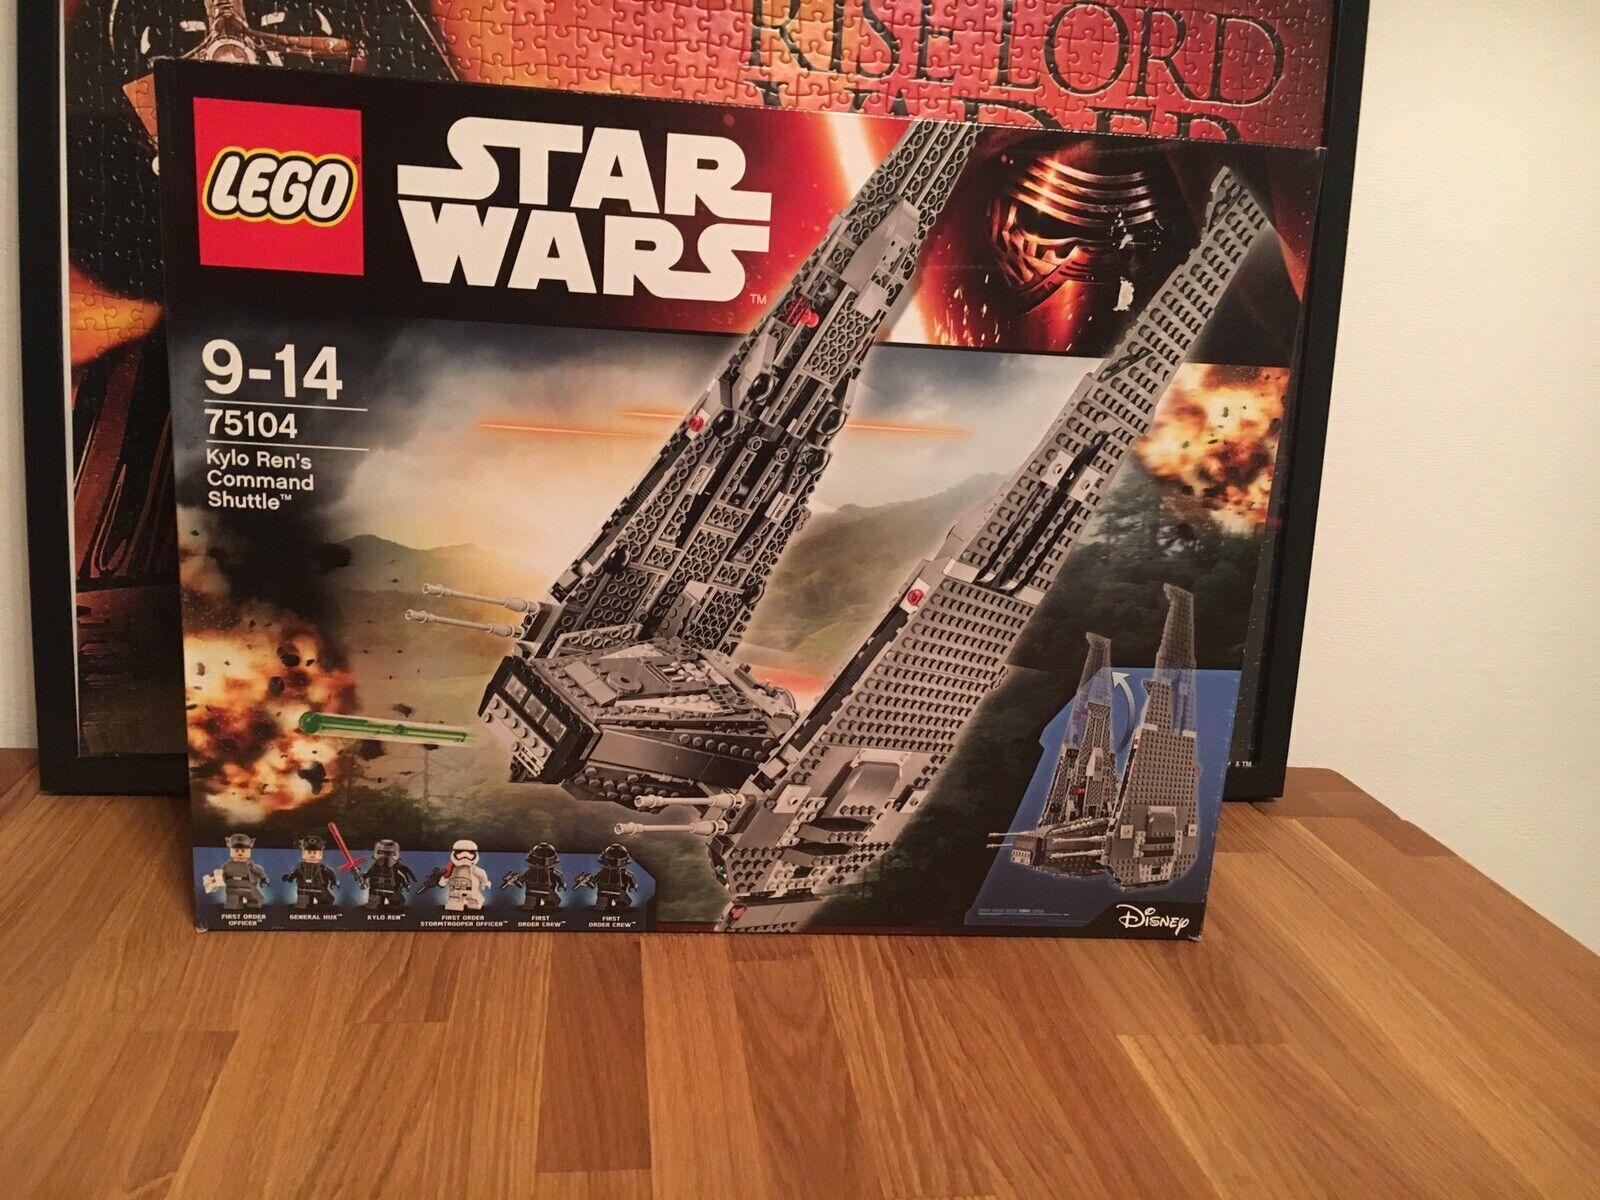 Lego Star Wars 75104-kylo ren's command Shuttle (nuevo en el embalaje original)